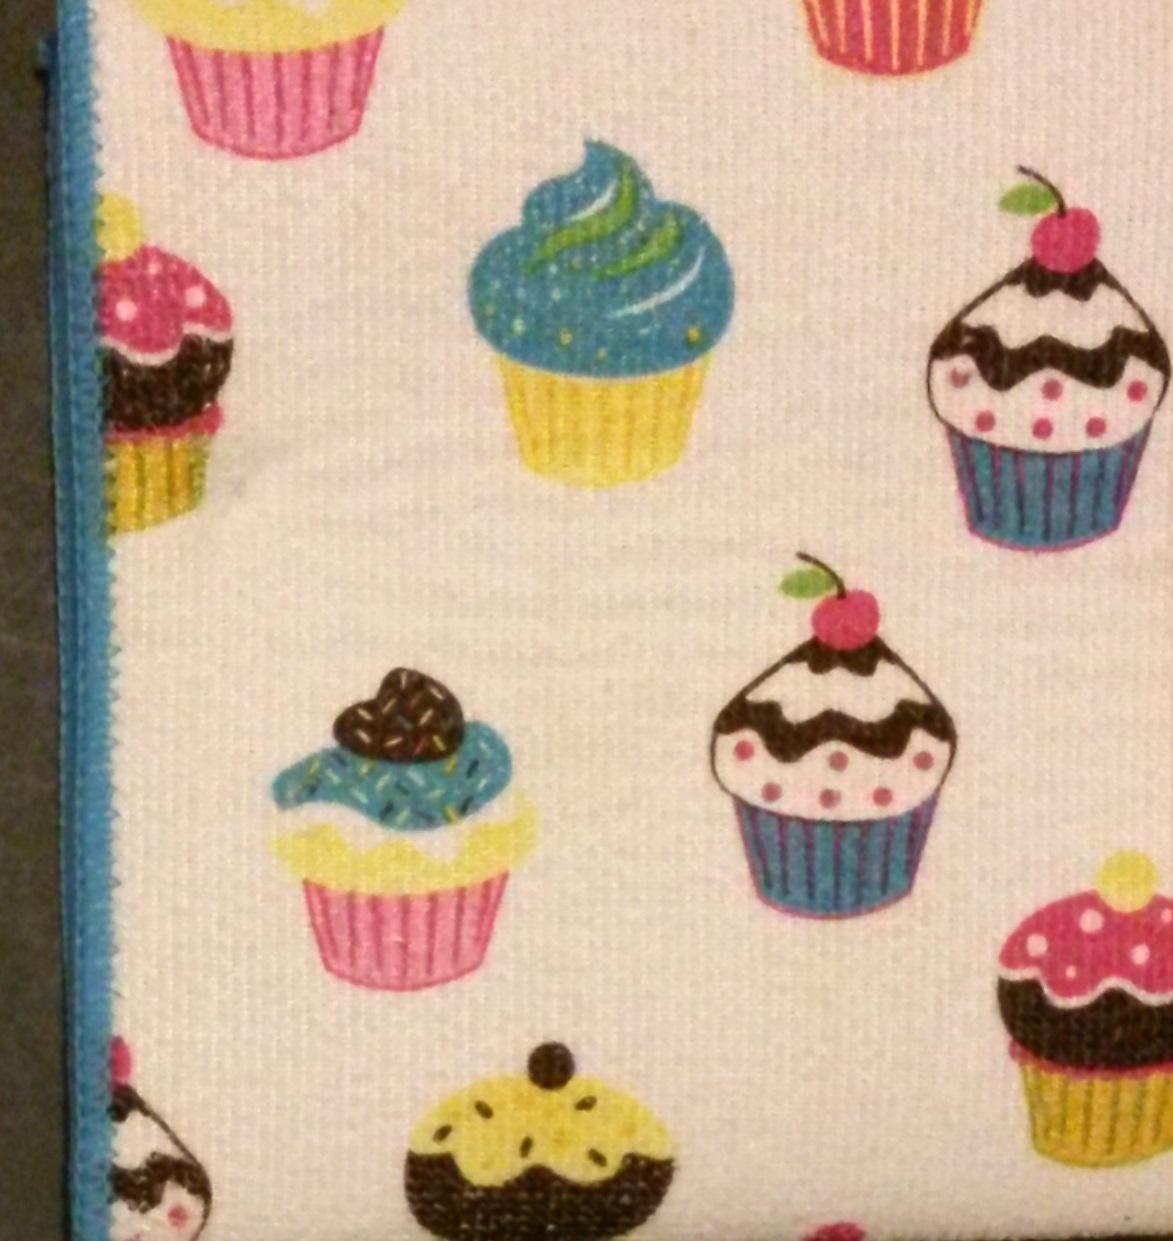 Cupcake Theme Kitchen Linens Set 3 Pc Drying Mat Towel Cloth Cupcakes Blue New Towels Dishcloths